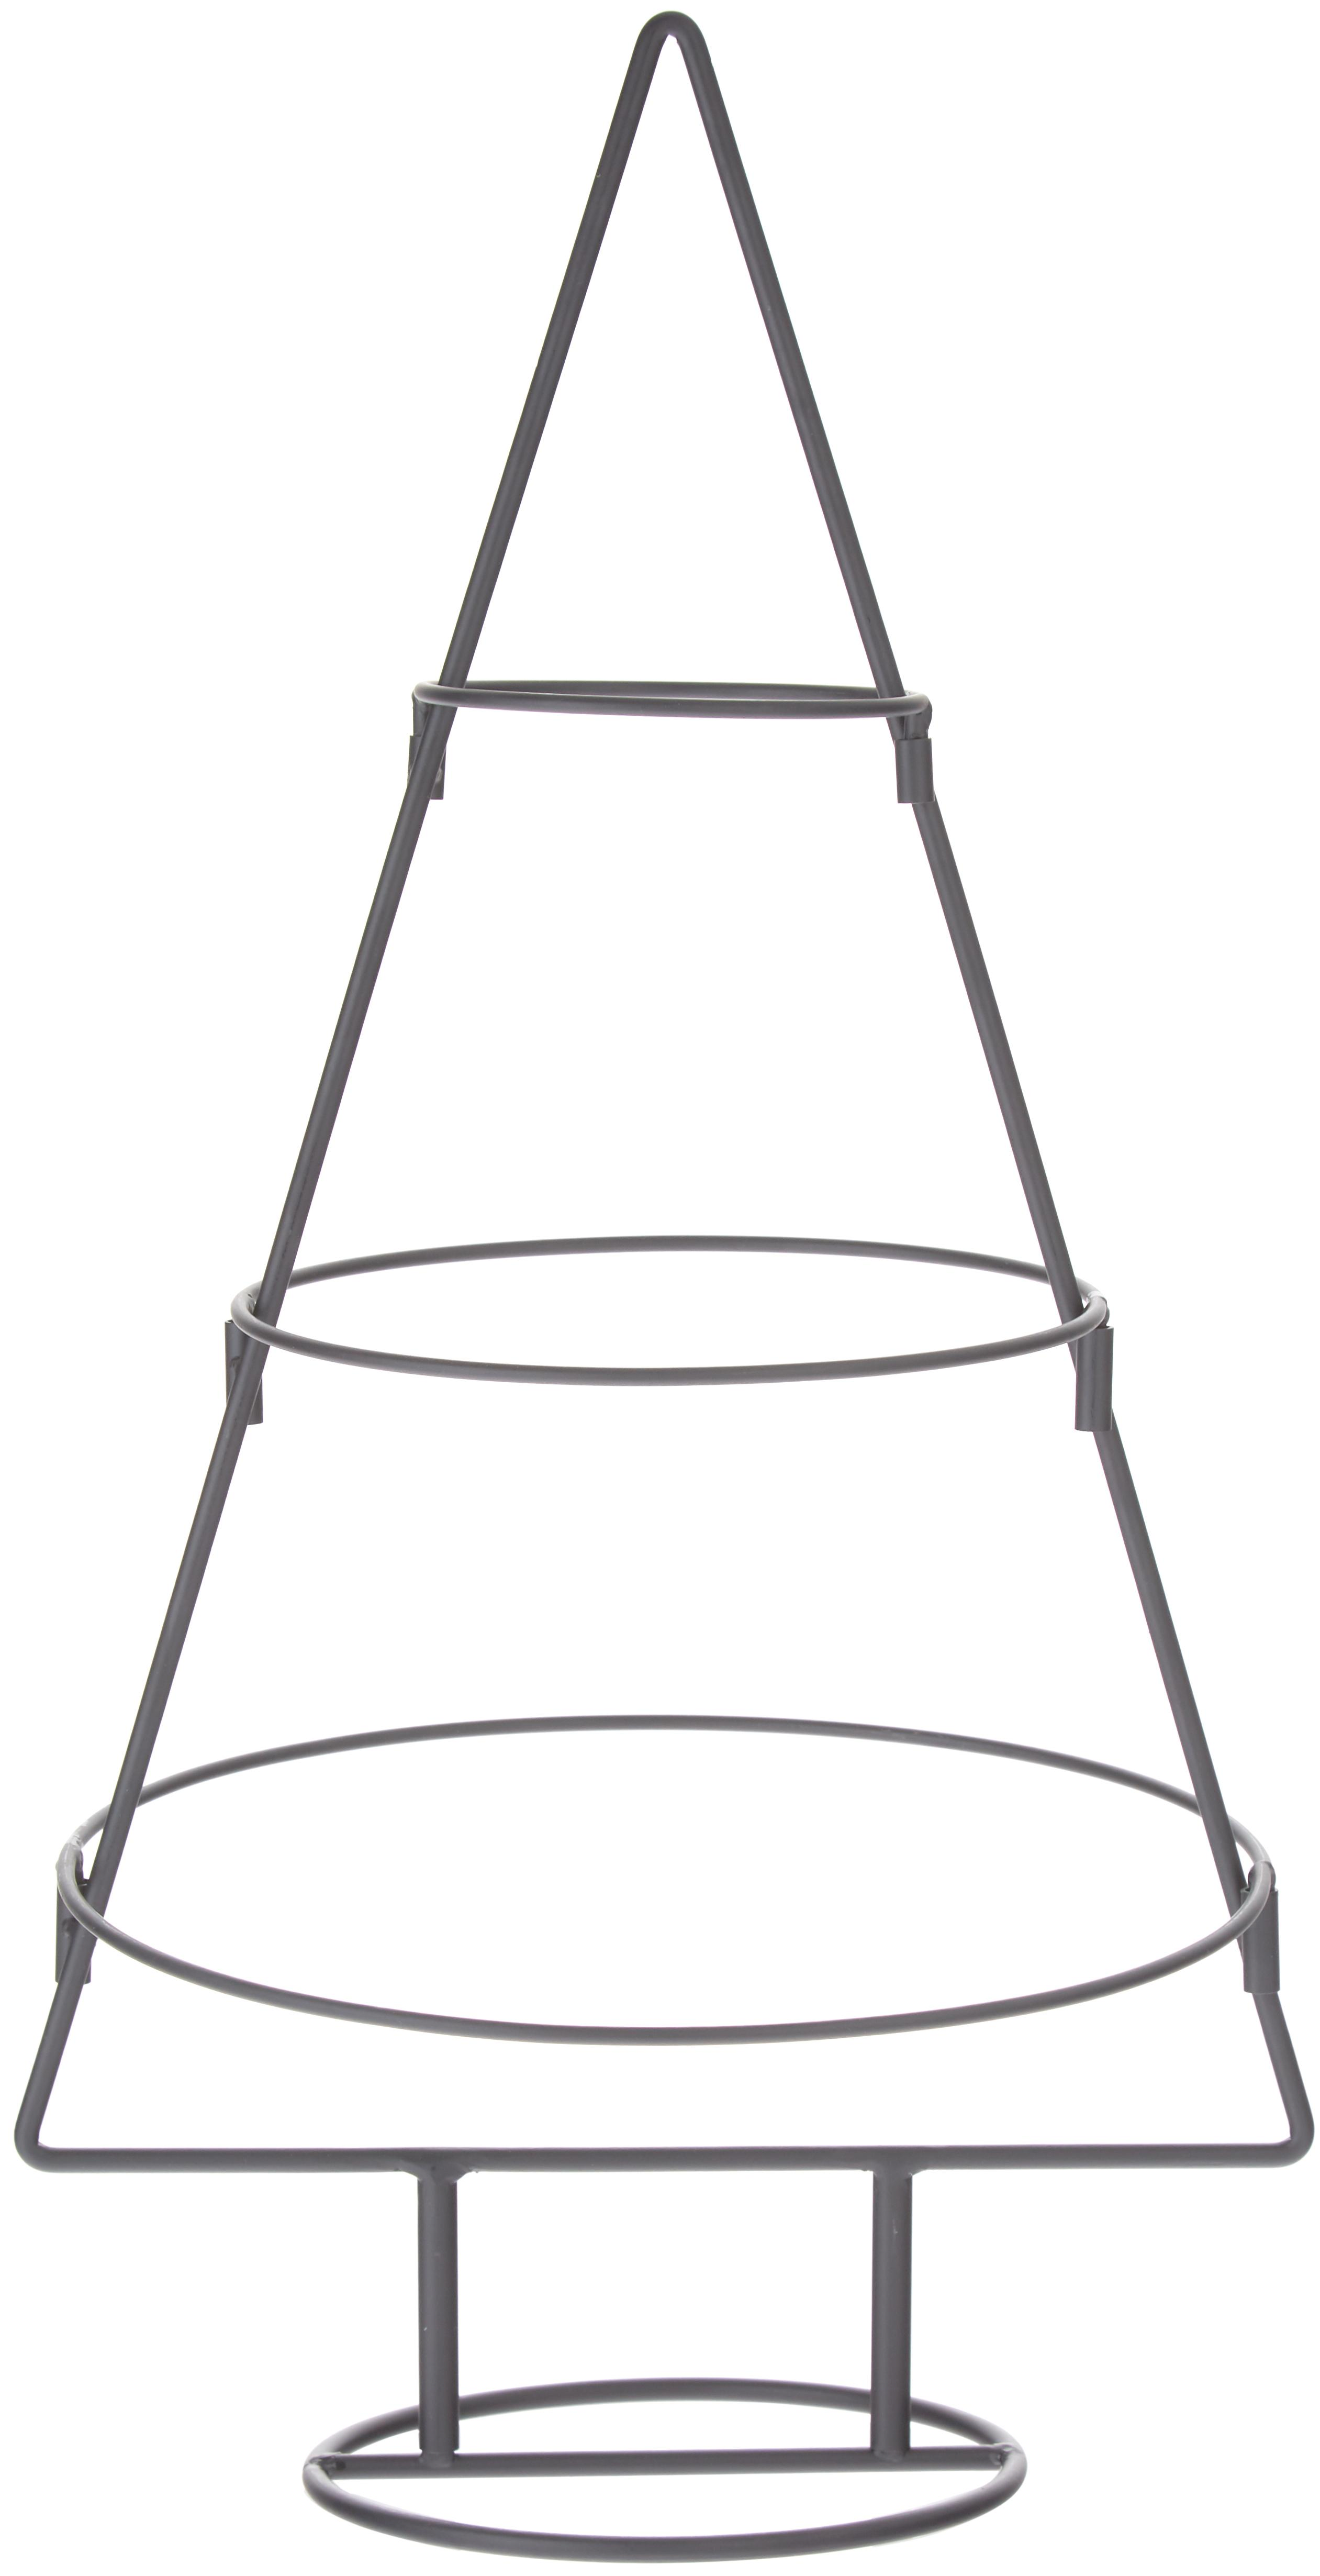 Deko-Objekt Arena, Metall, lackiert, Schwarz, 32 x 60 cm